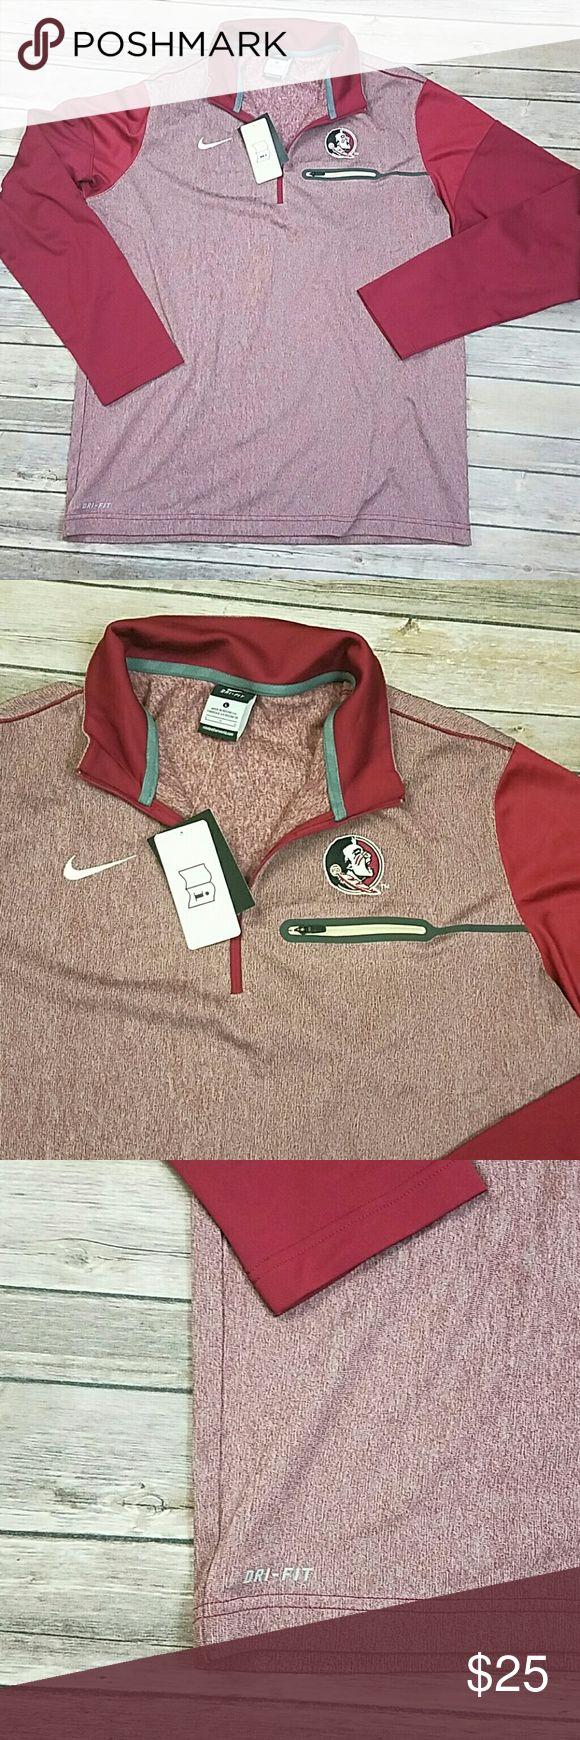 Nike dri-fit FSU jacket brand new FSU football jacket men's large 51% rayon 43% polyester 6% spandex Nike Jackets & Coats Lightweight & Shirt Jackets